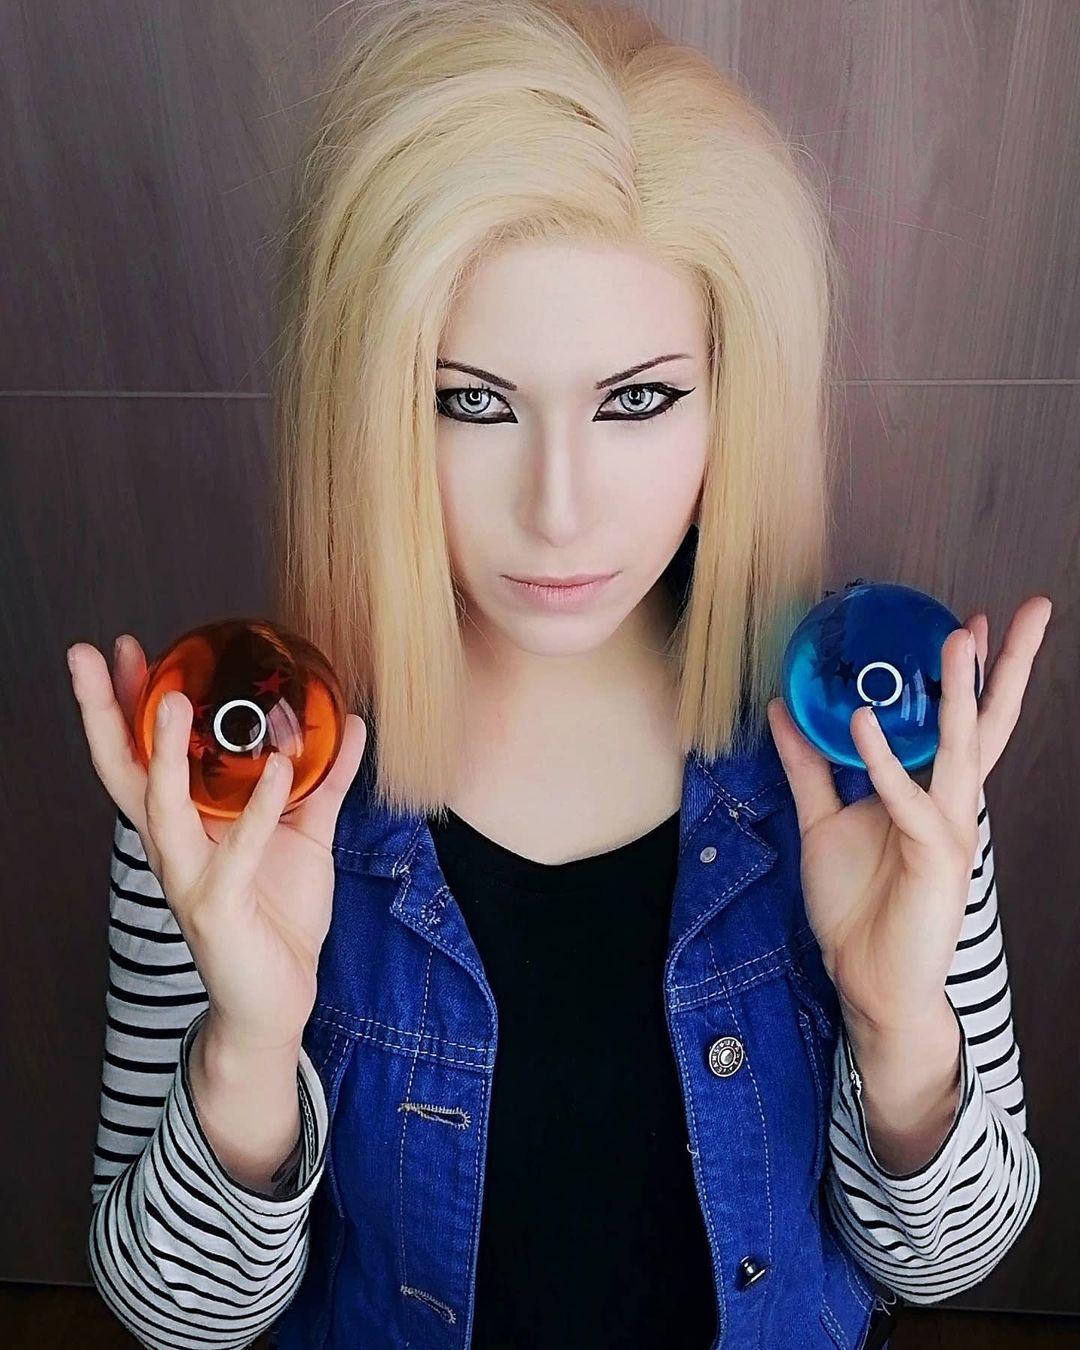 Fotografía de la cosplayer Kurai_ame de Androide 18 de 'Dragon Ball'.